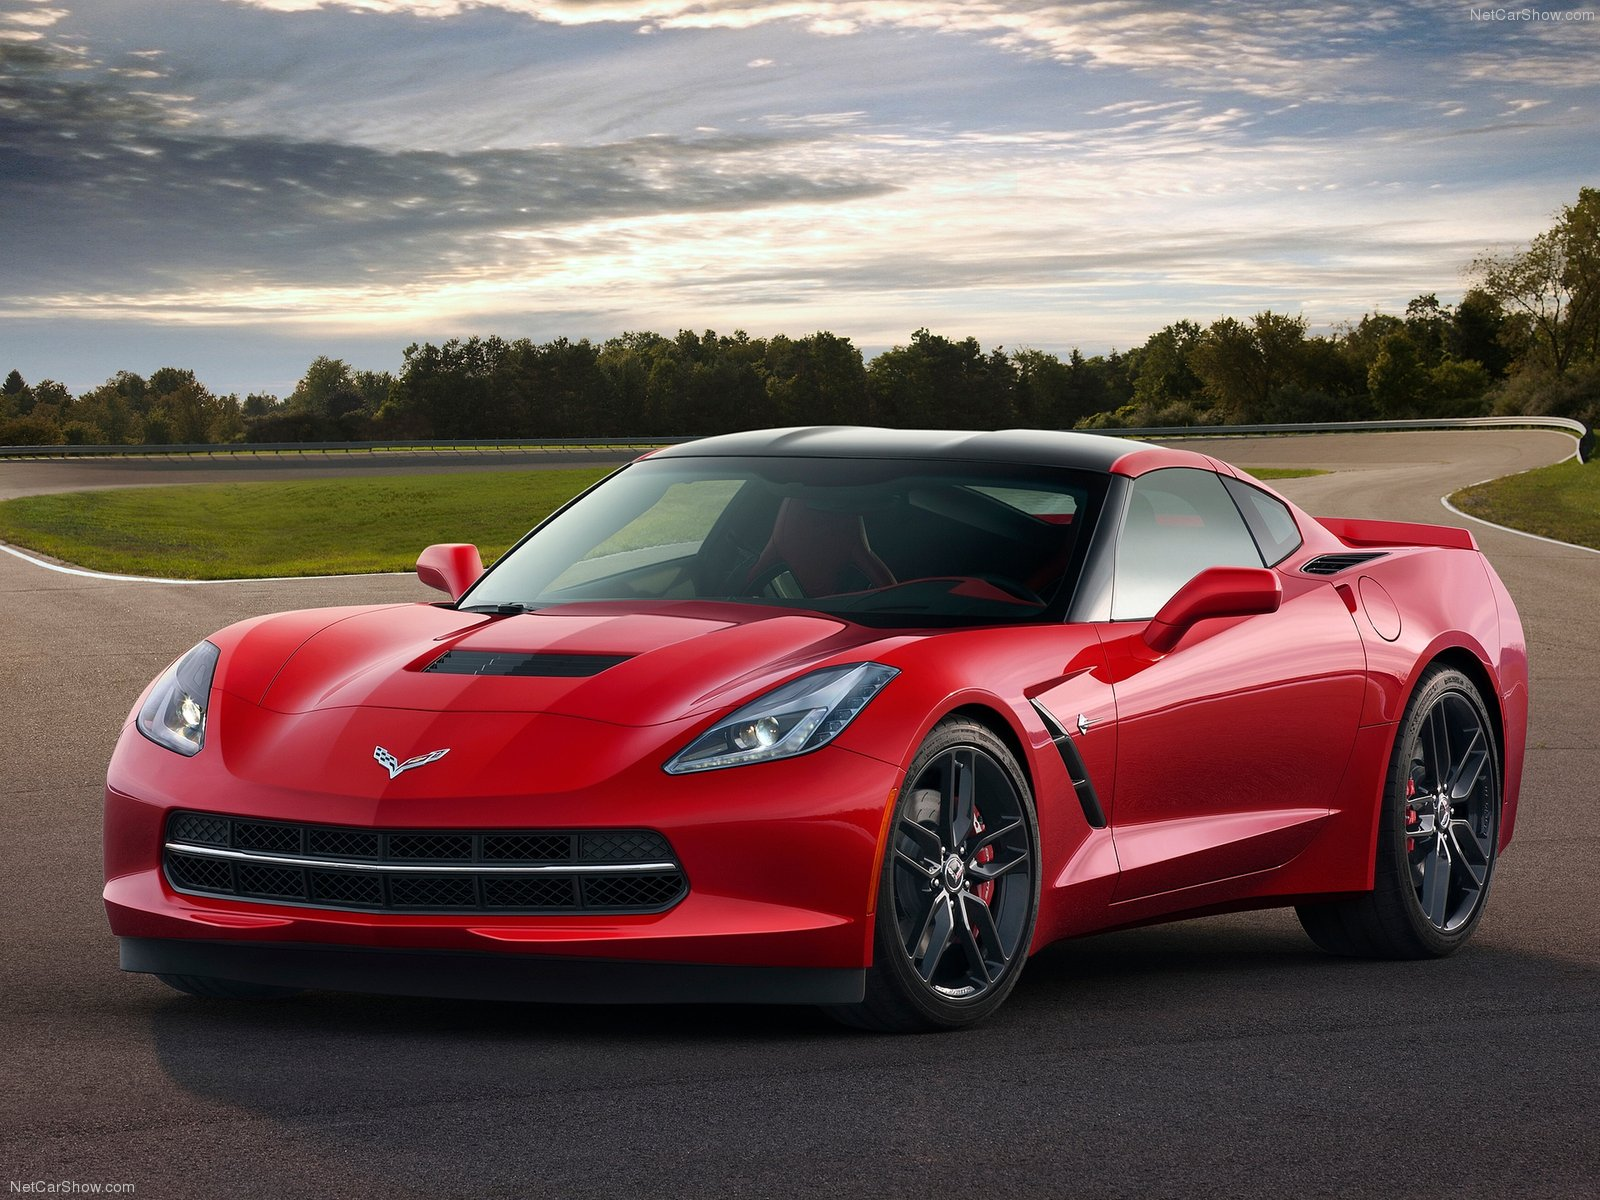 http://4.bp.blogspot.com/-EhxXKztO4LQ/UPToLNmT3EI/AAAAAAAABHg/VJe0V9iVGrI/s1600/Chevrolet-Corvette_C7_Stingray_2014_1600x1200_wallpaper_03.jpg